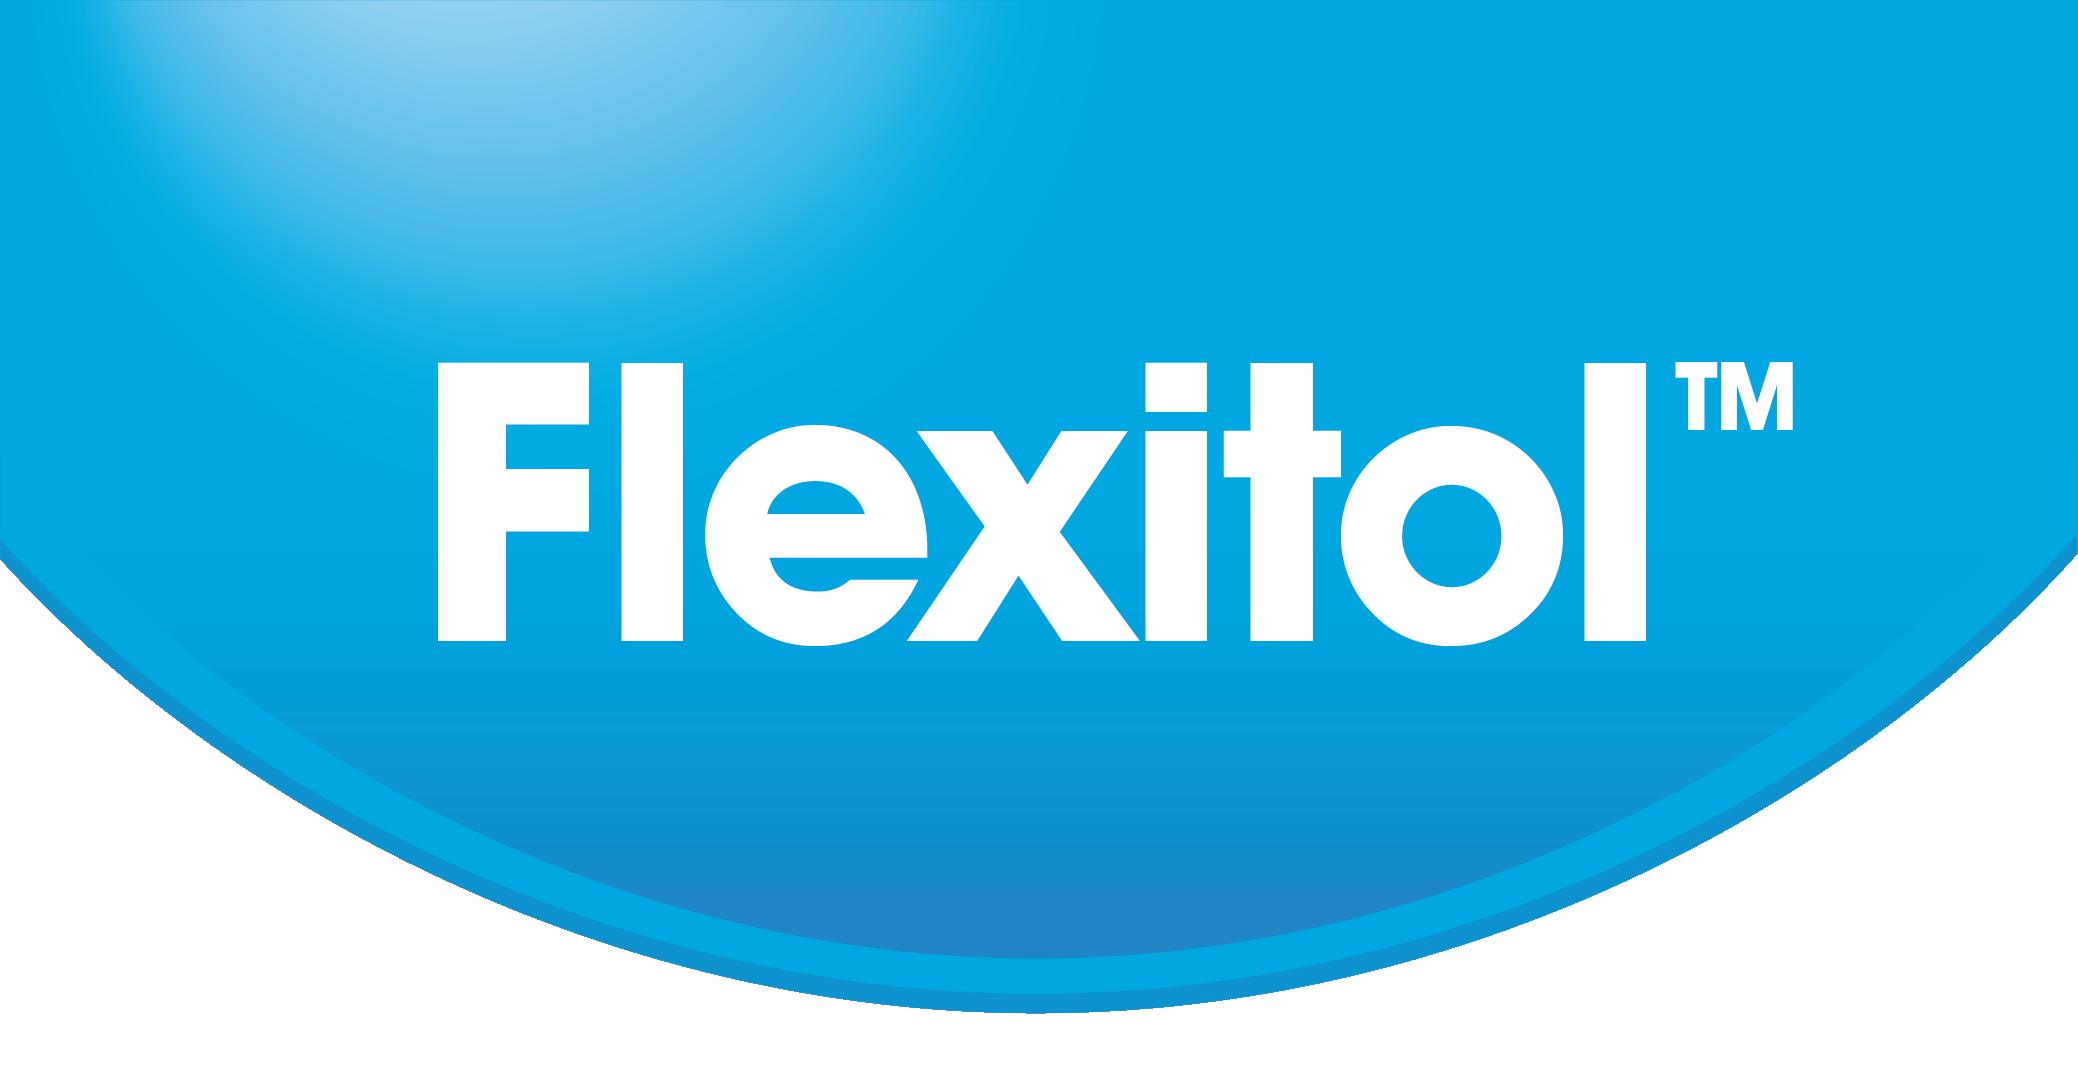 Flexitol Israel